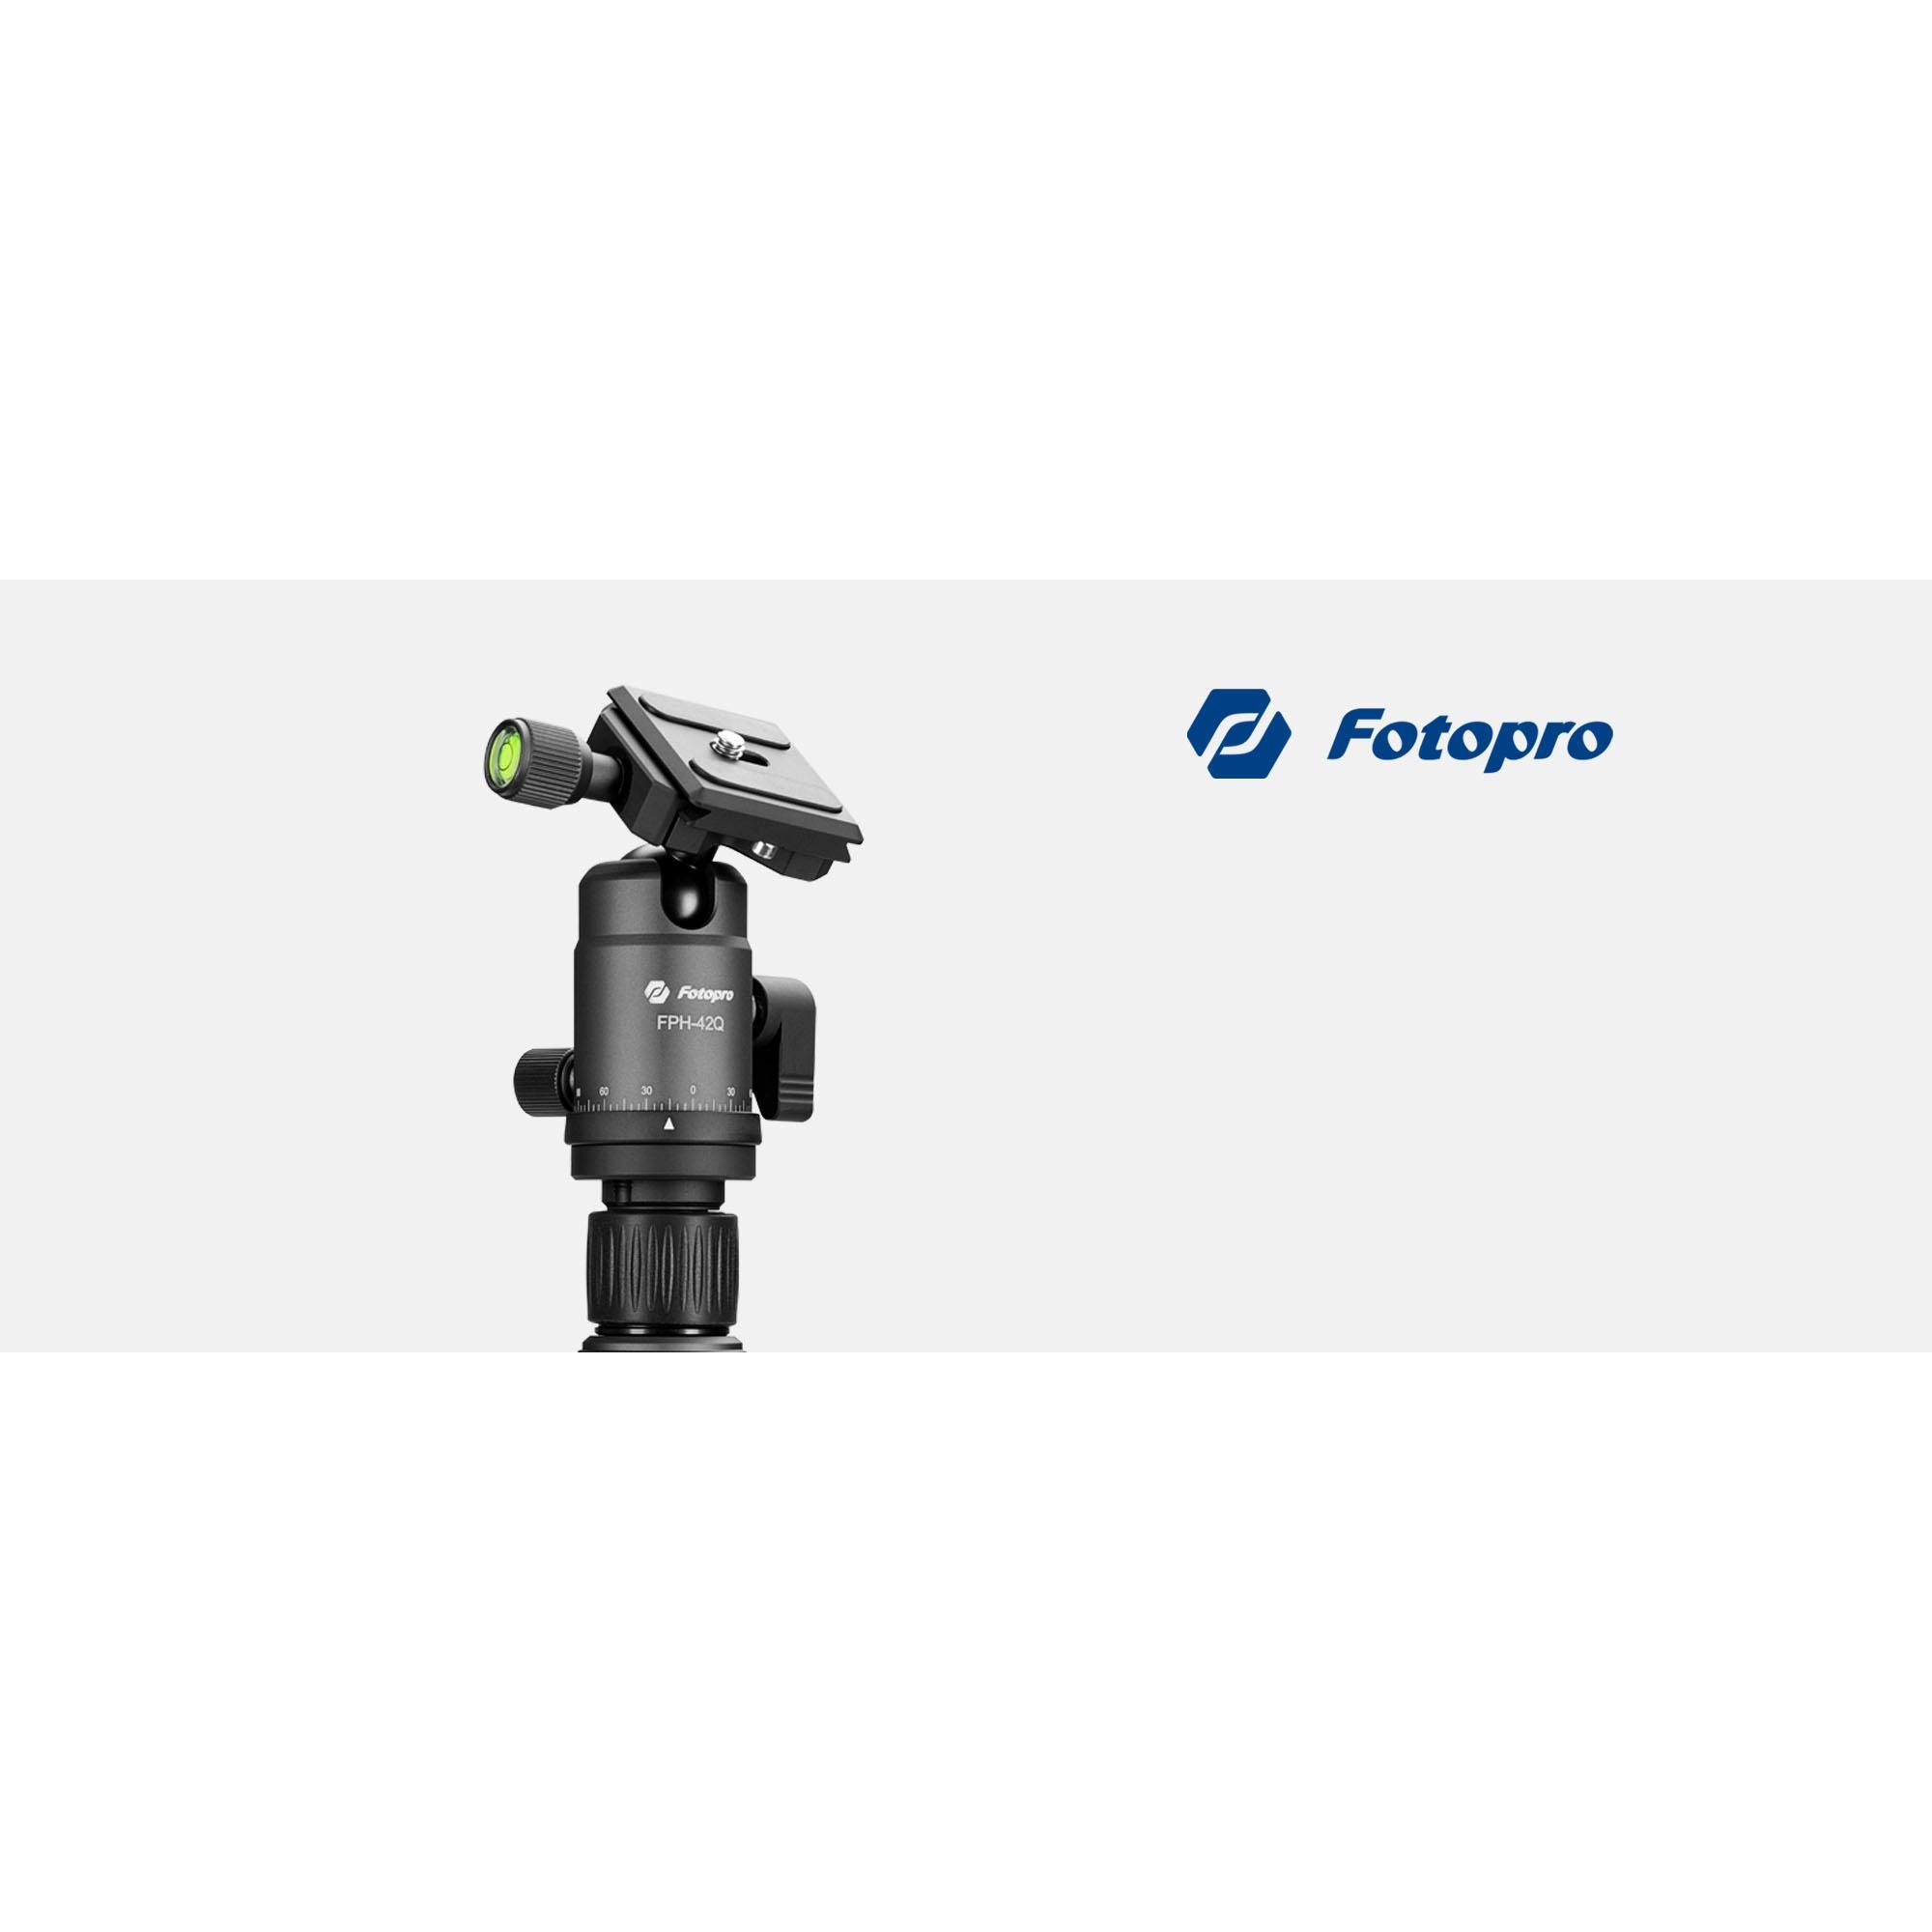 Fotopro X-go Gecko tripod with FPH-42Q ball head